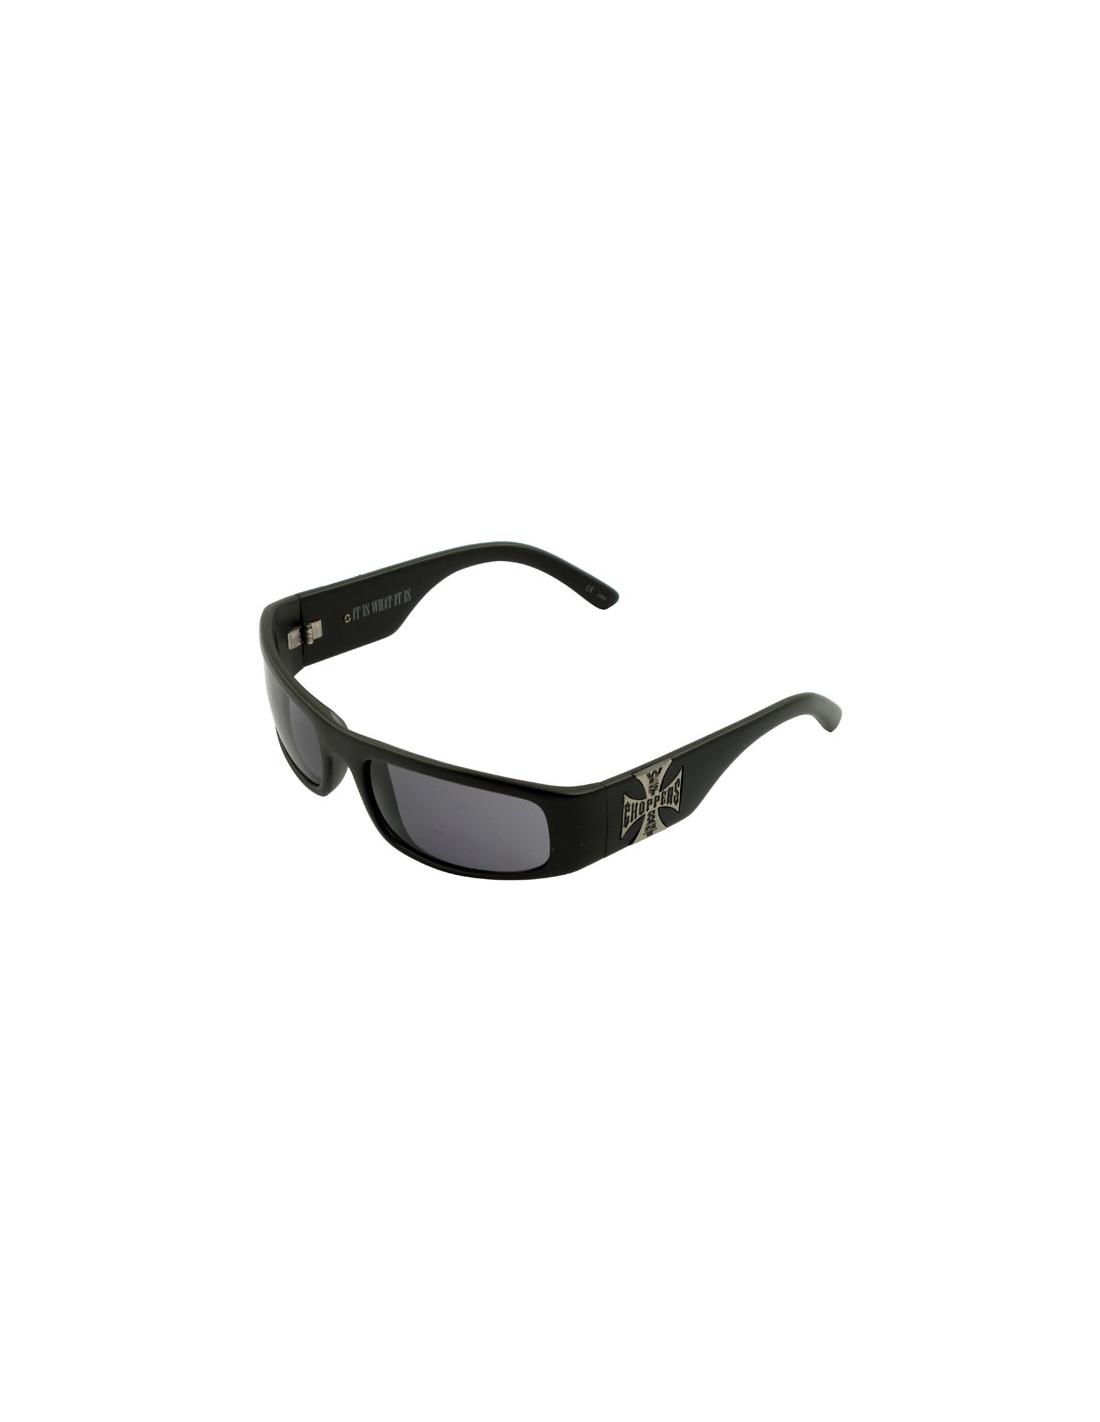 c9ac942b86 West Coast Choppers Glasses - Original Cross Black. Next